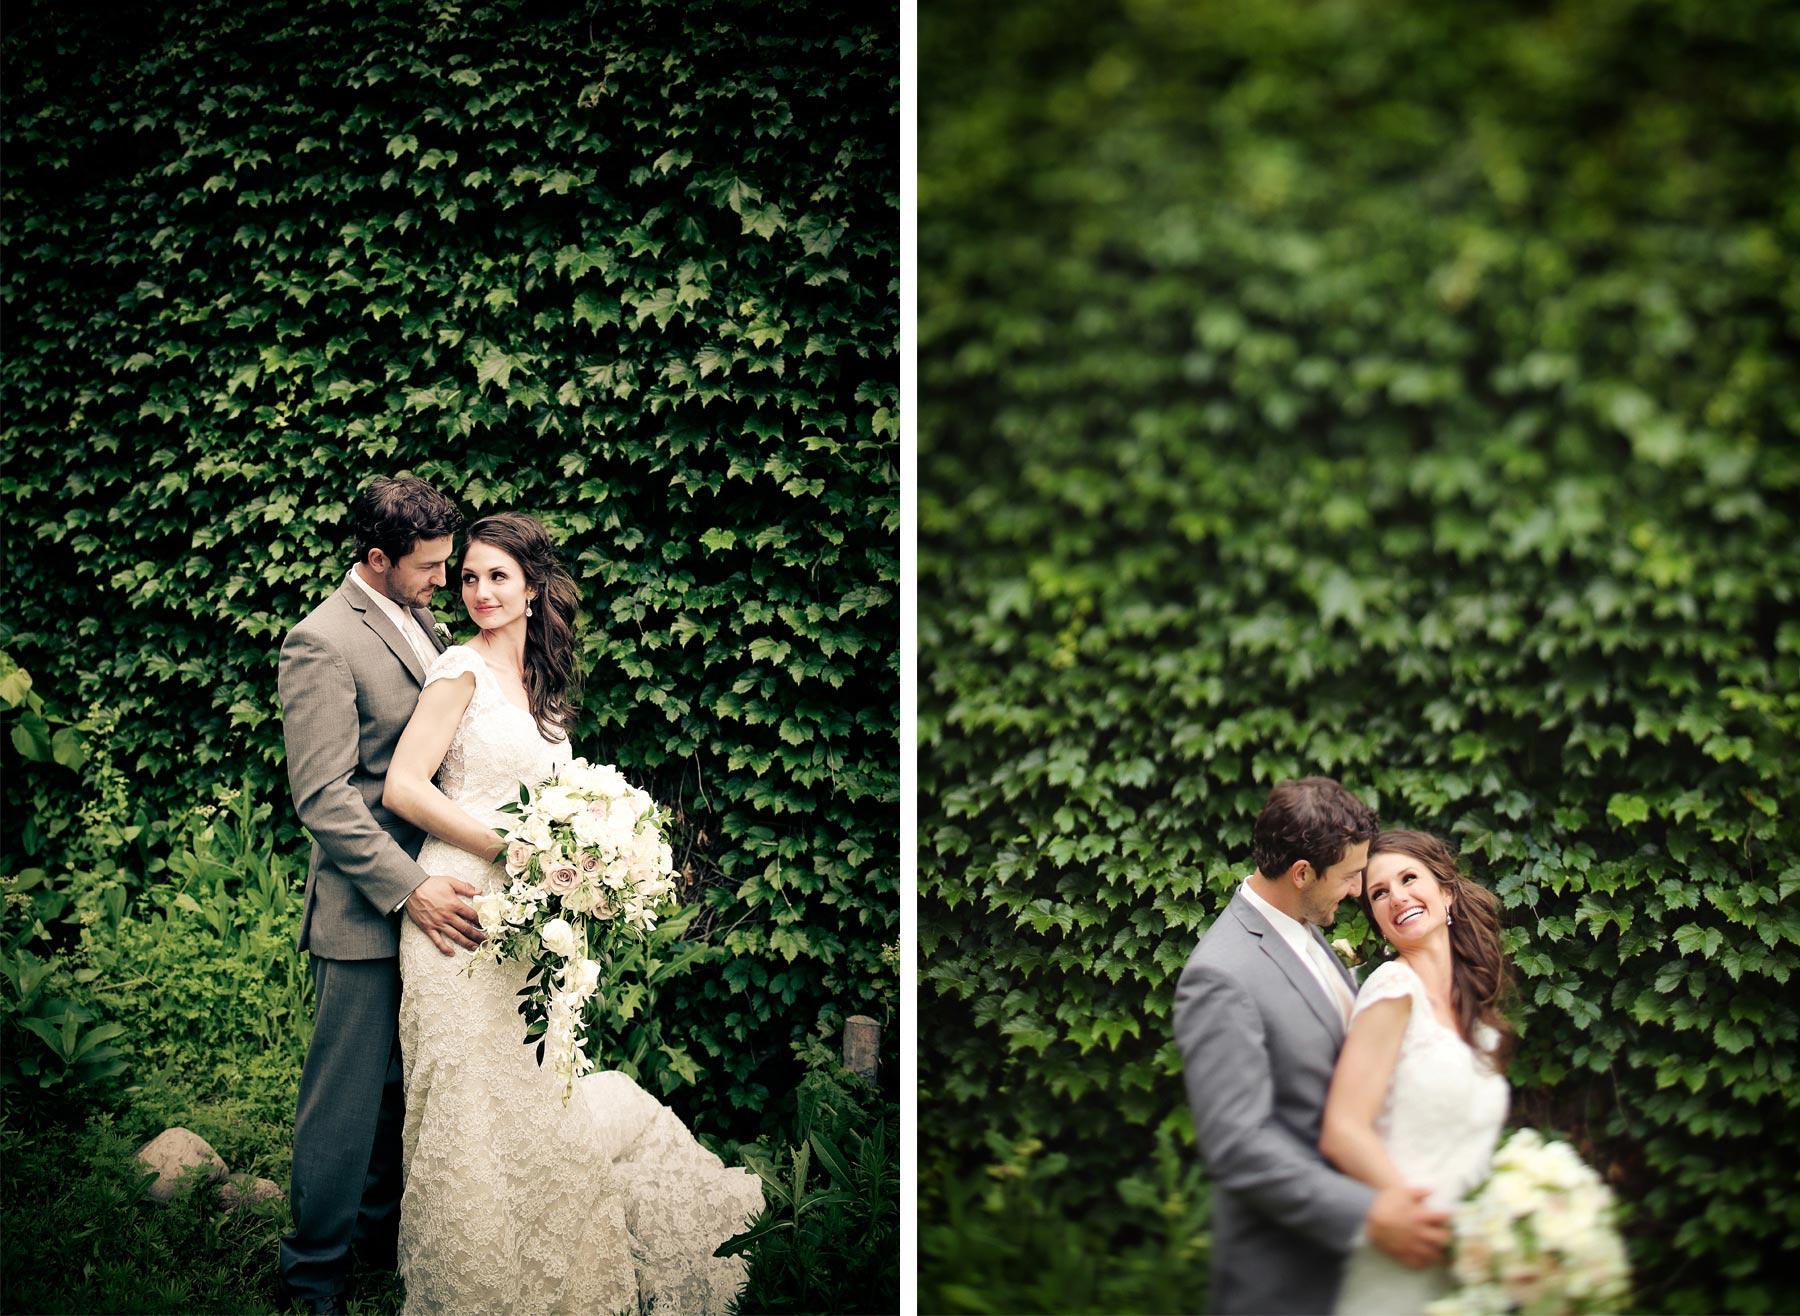 14-Stillwater-Minnesota-Wedding-Photography-by-Vick-Photography--Alicia-&-Cole.jpg